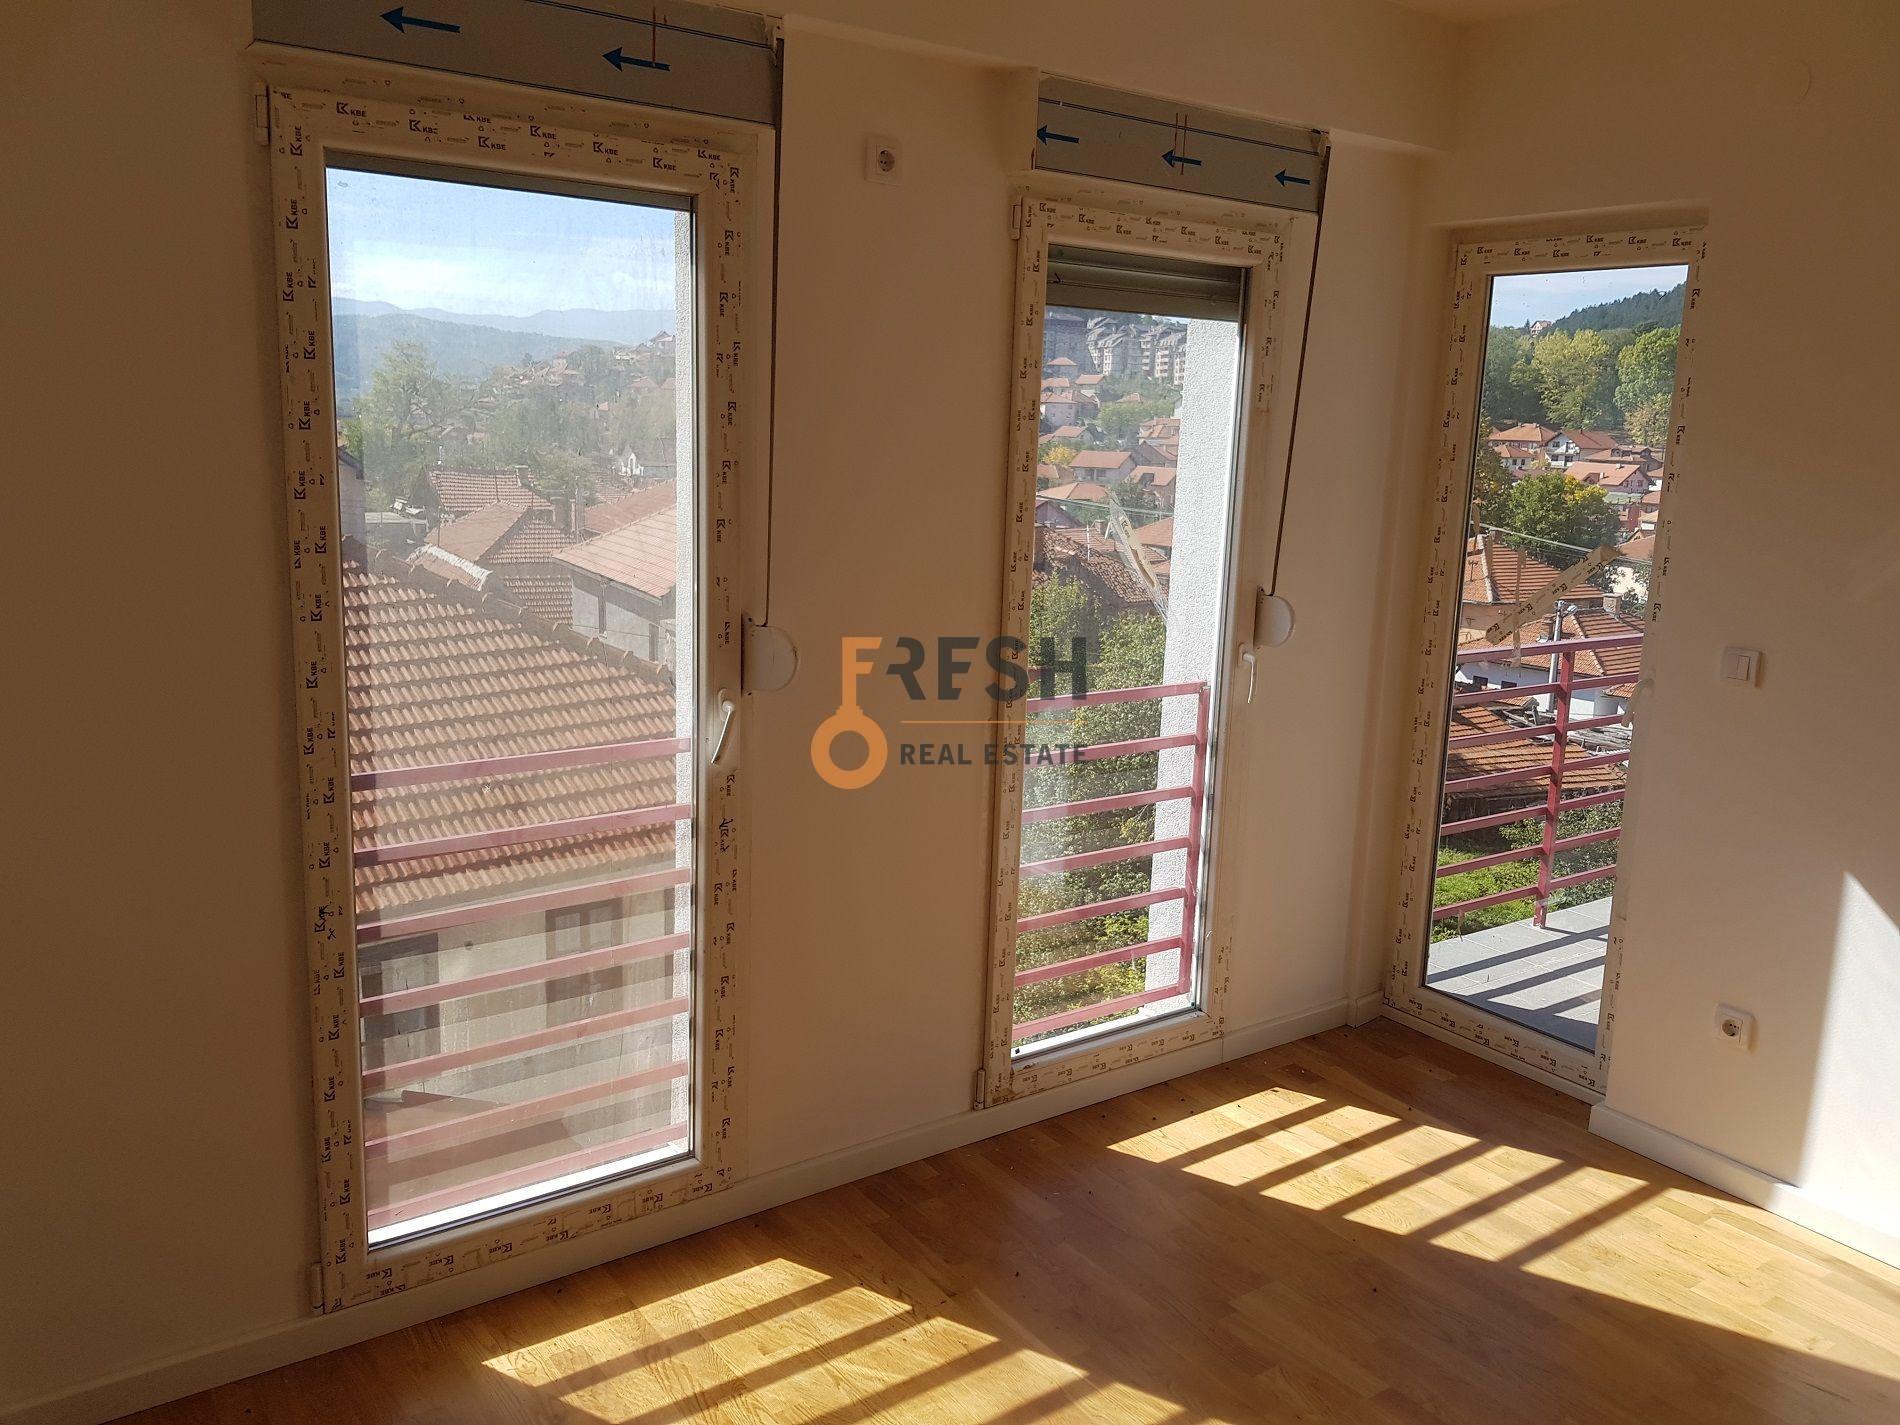 Jednosoban stan 45 m2, Centar, Pljevlja, Prodaja - 9